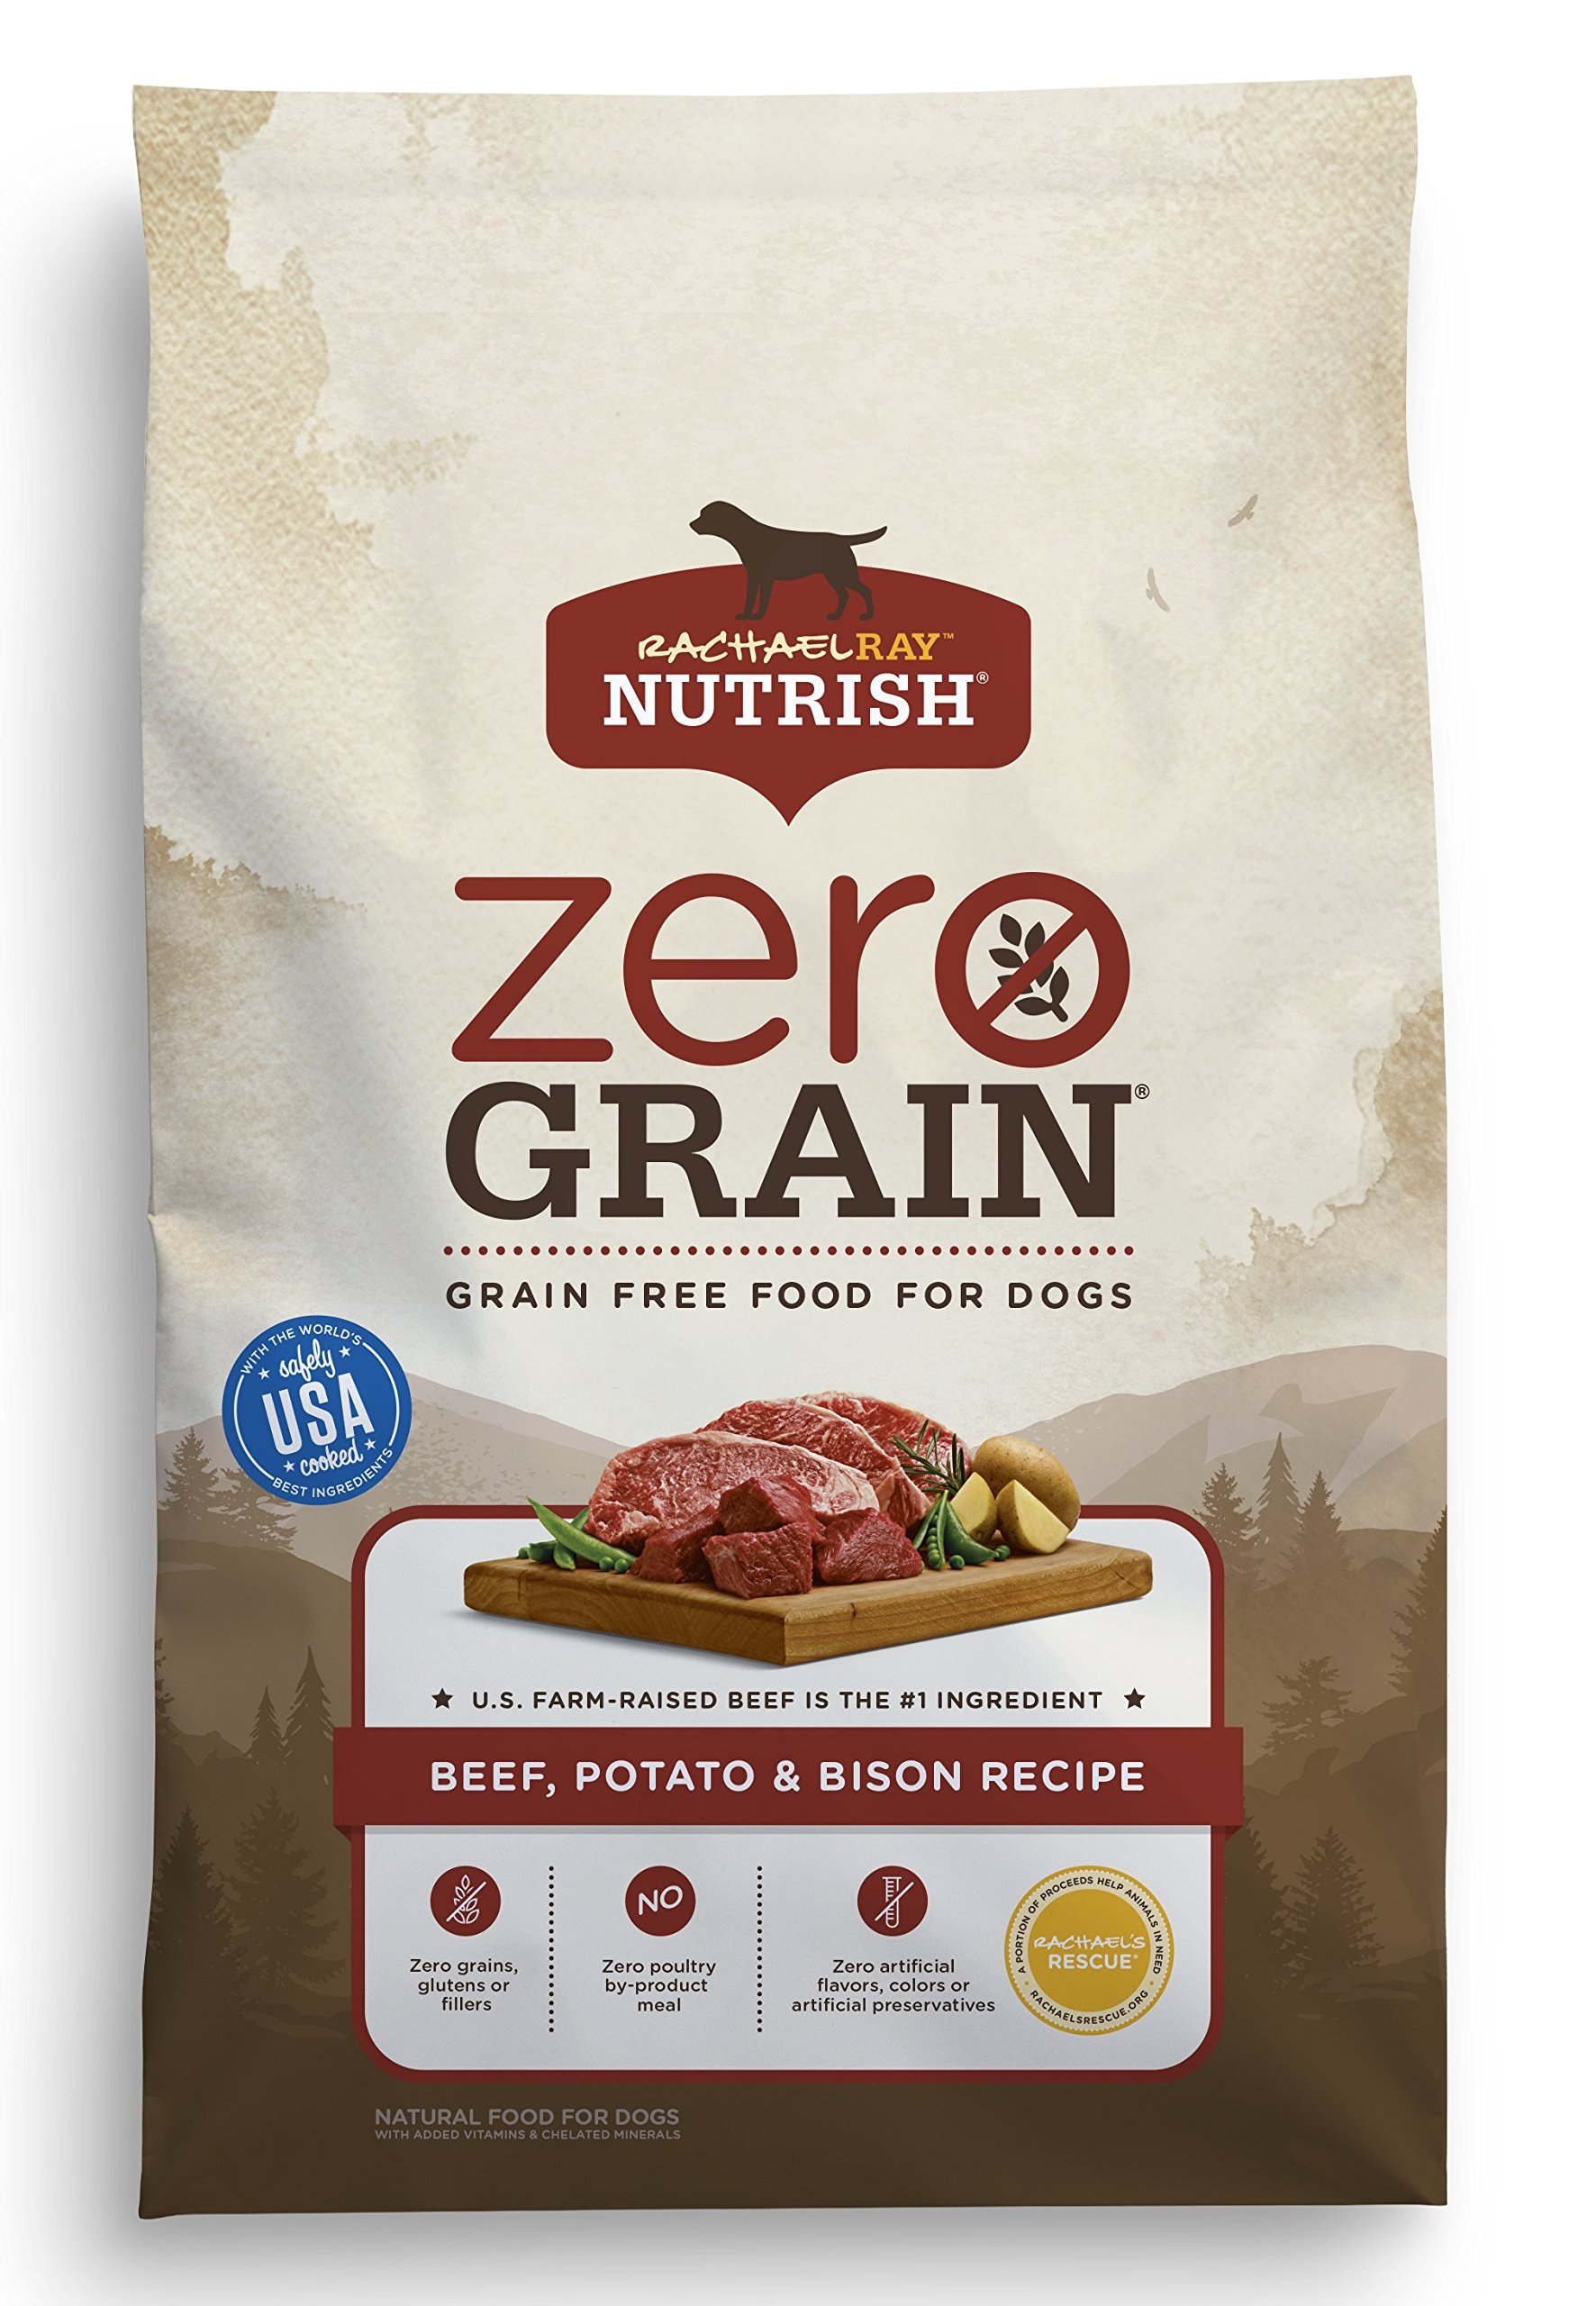 Rachael Ray Nutrish Zero Grain Natural Grain Free Dry Dog Food Beef, Potato, & Bison